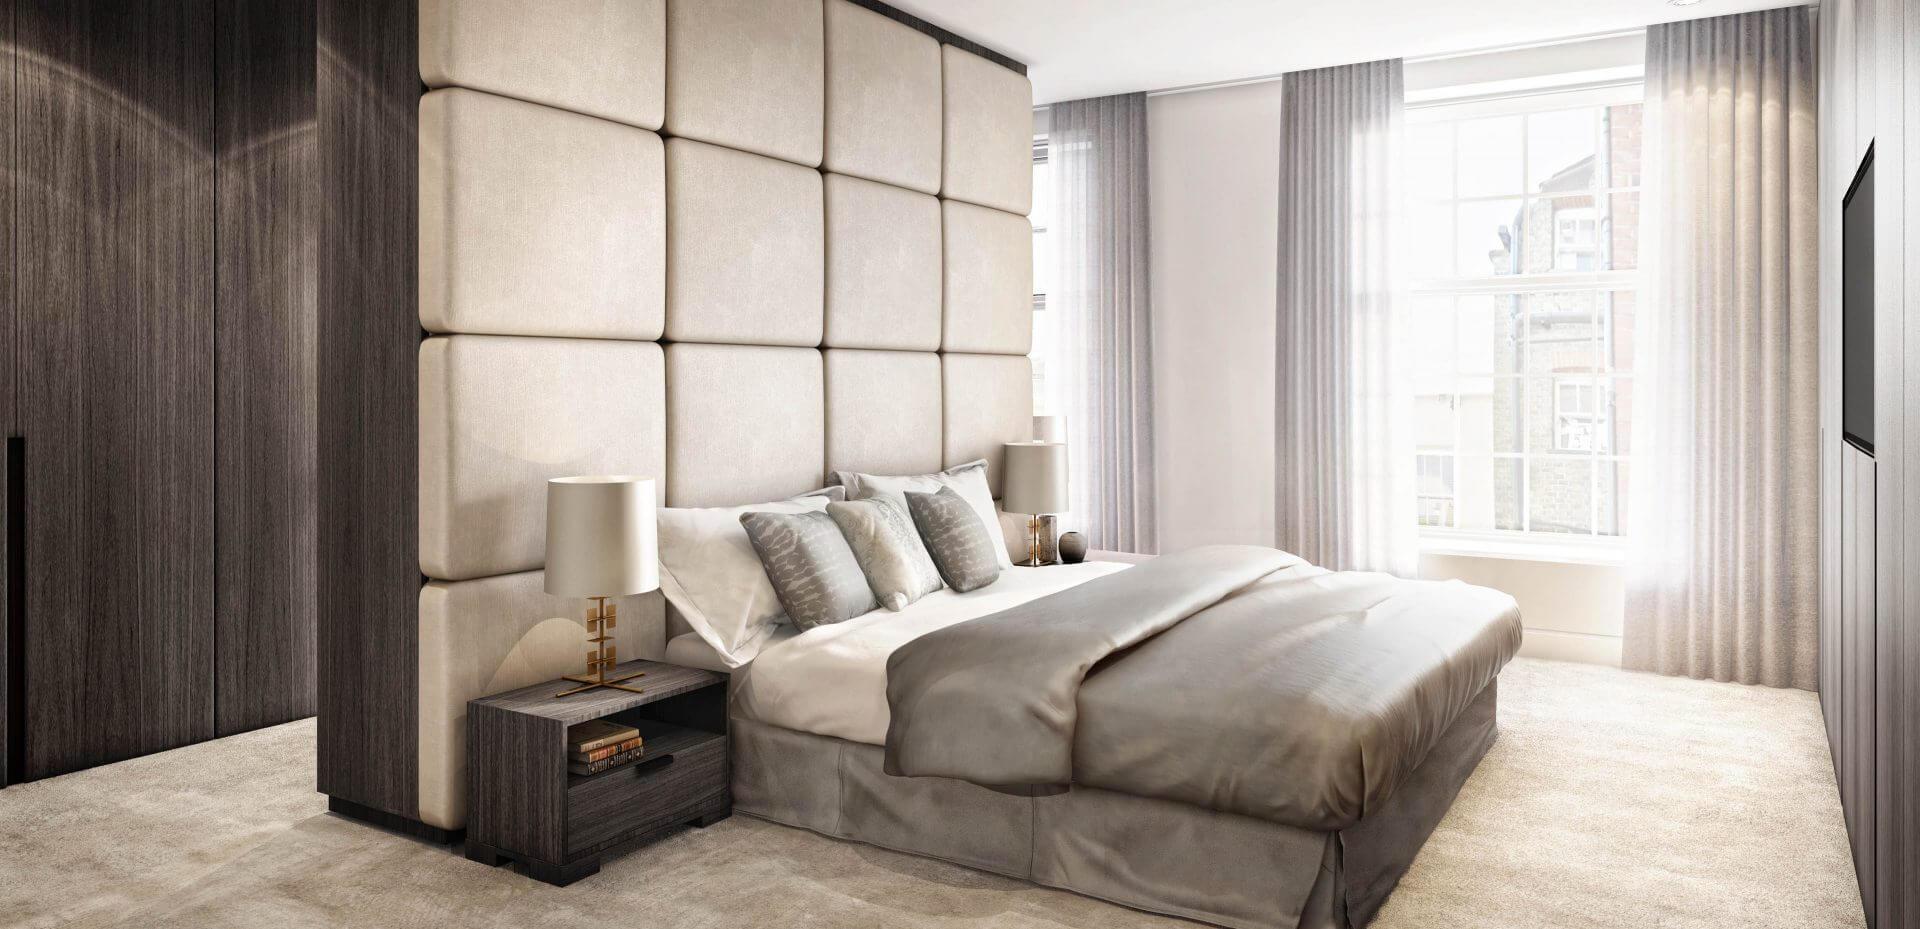 London penthouse master bedroom visualisation for Devonshire Properties